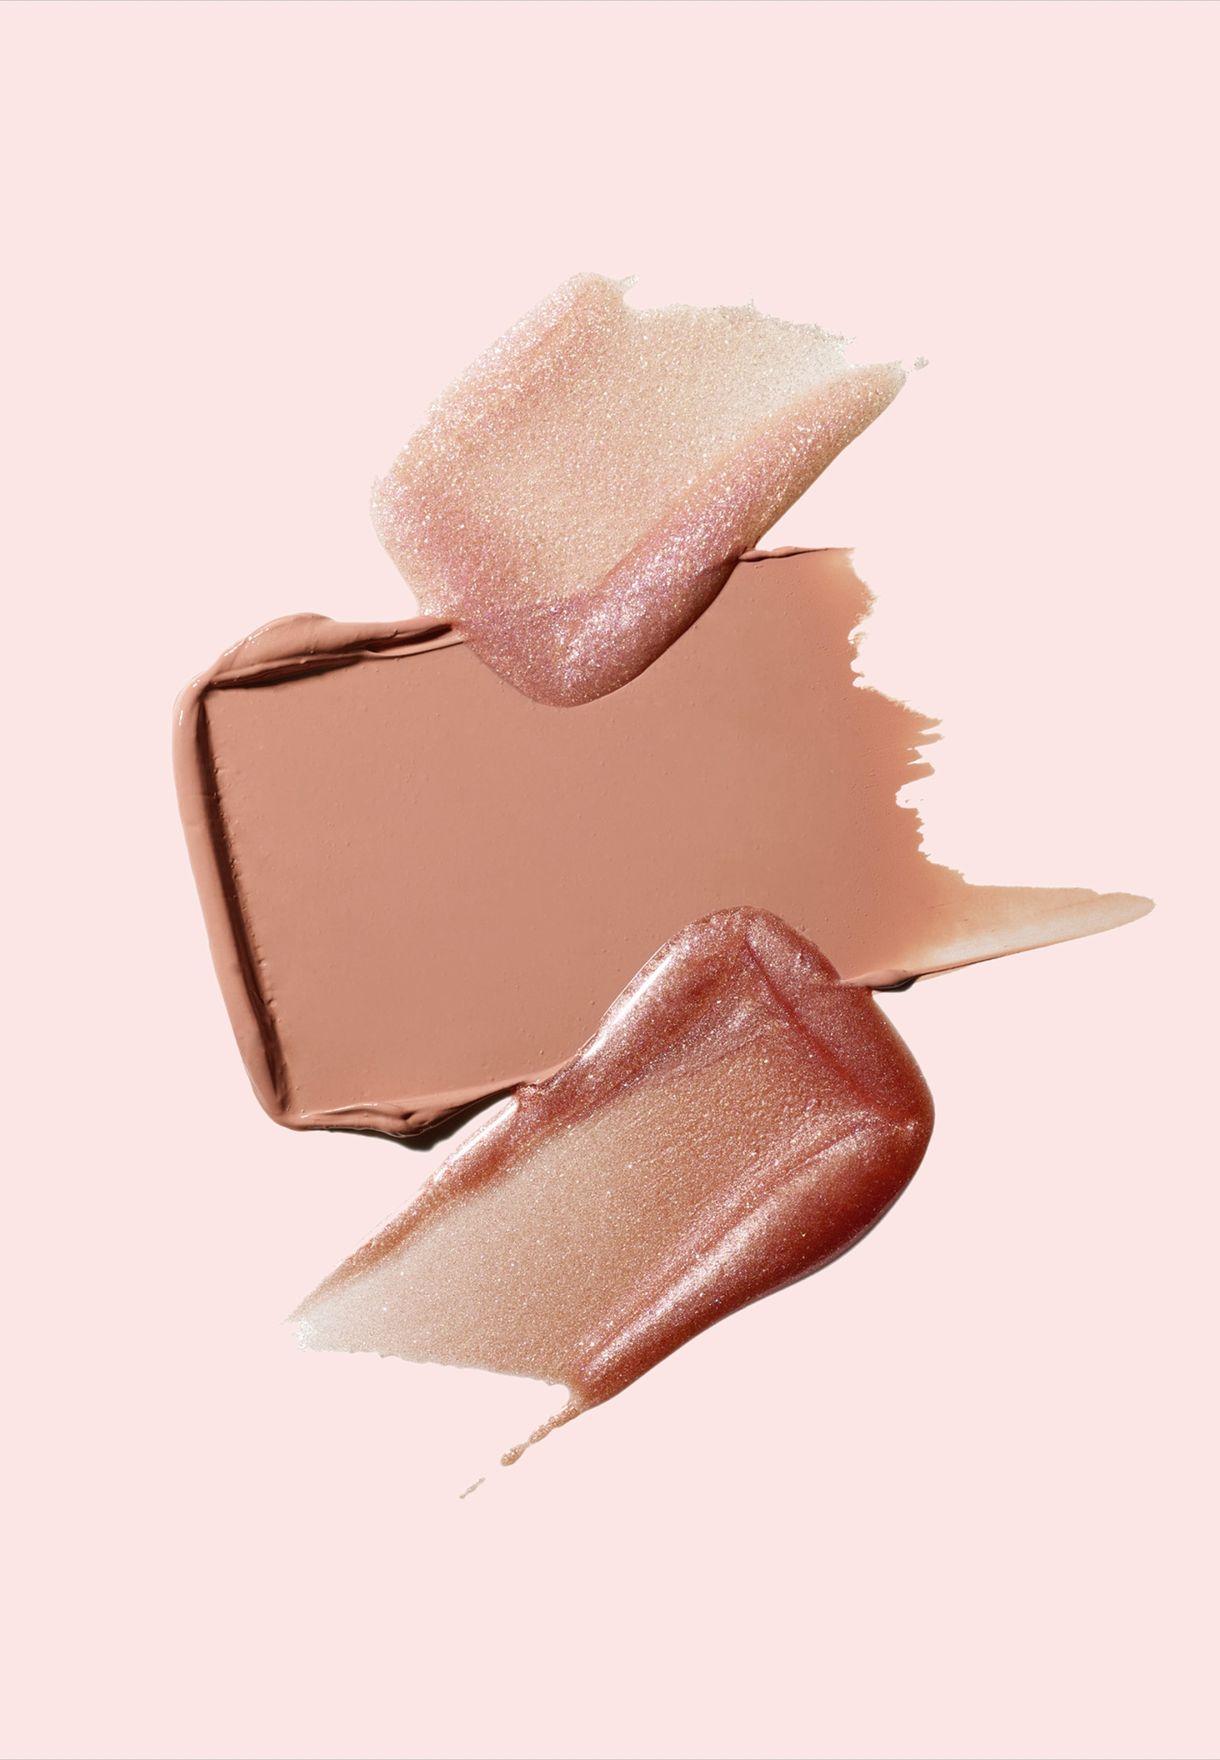 On The Go Nude Mini Lip Kit Saving 60%